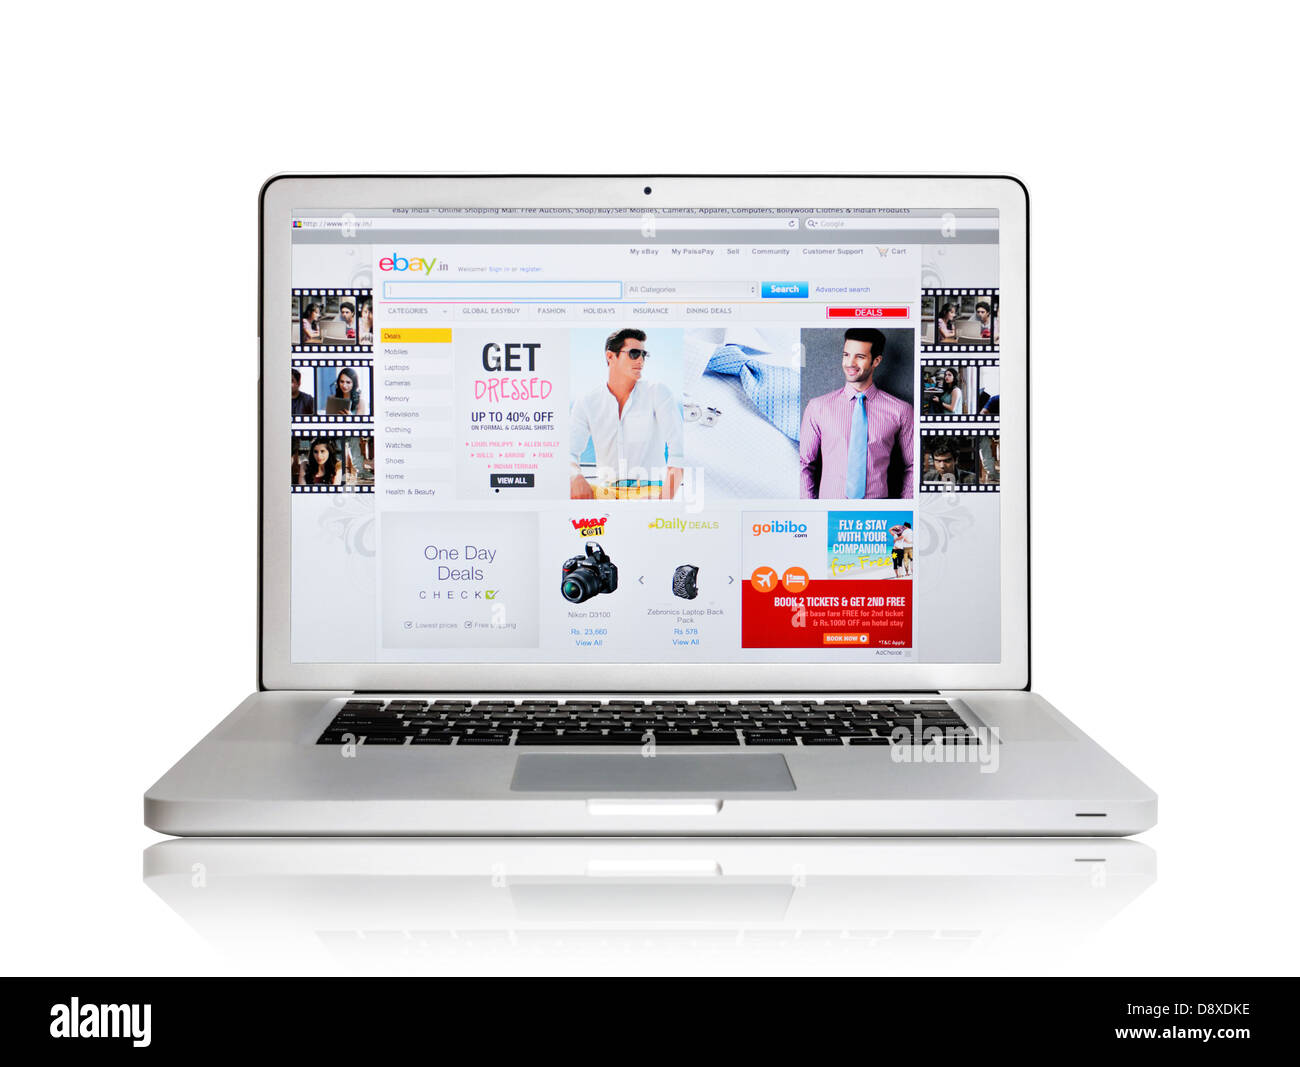 India Ebay Online Shopping Website Stock Photos & India Ebay